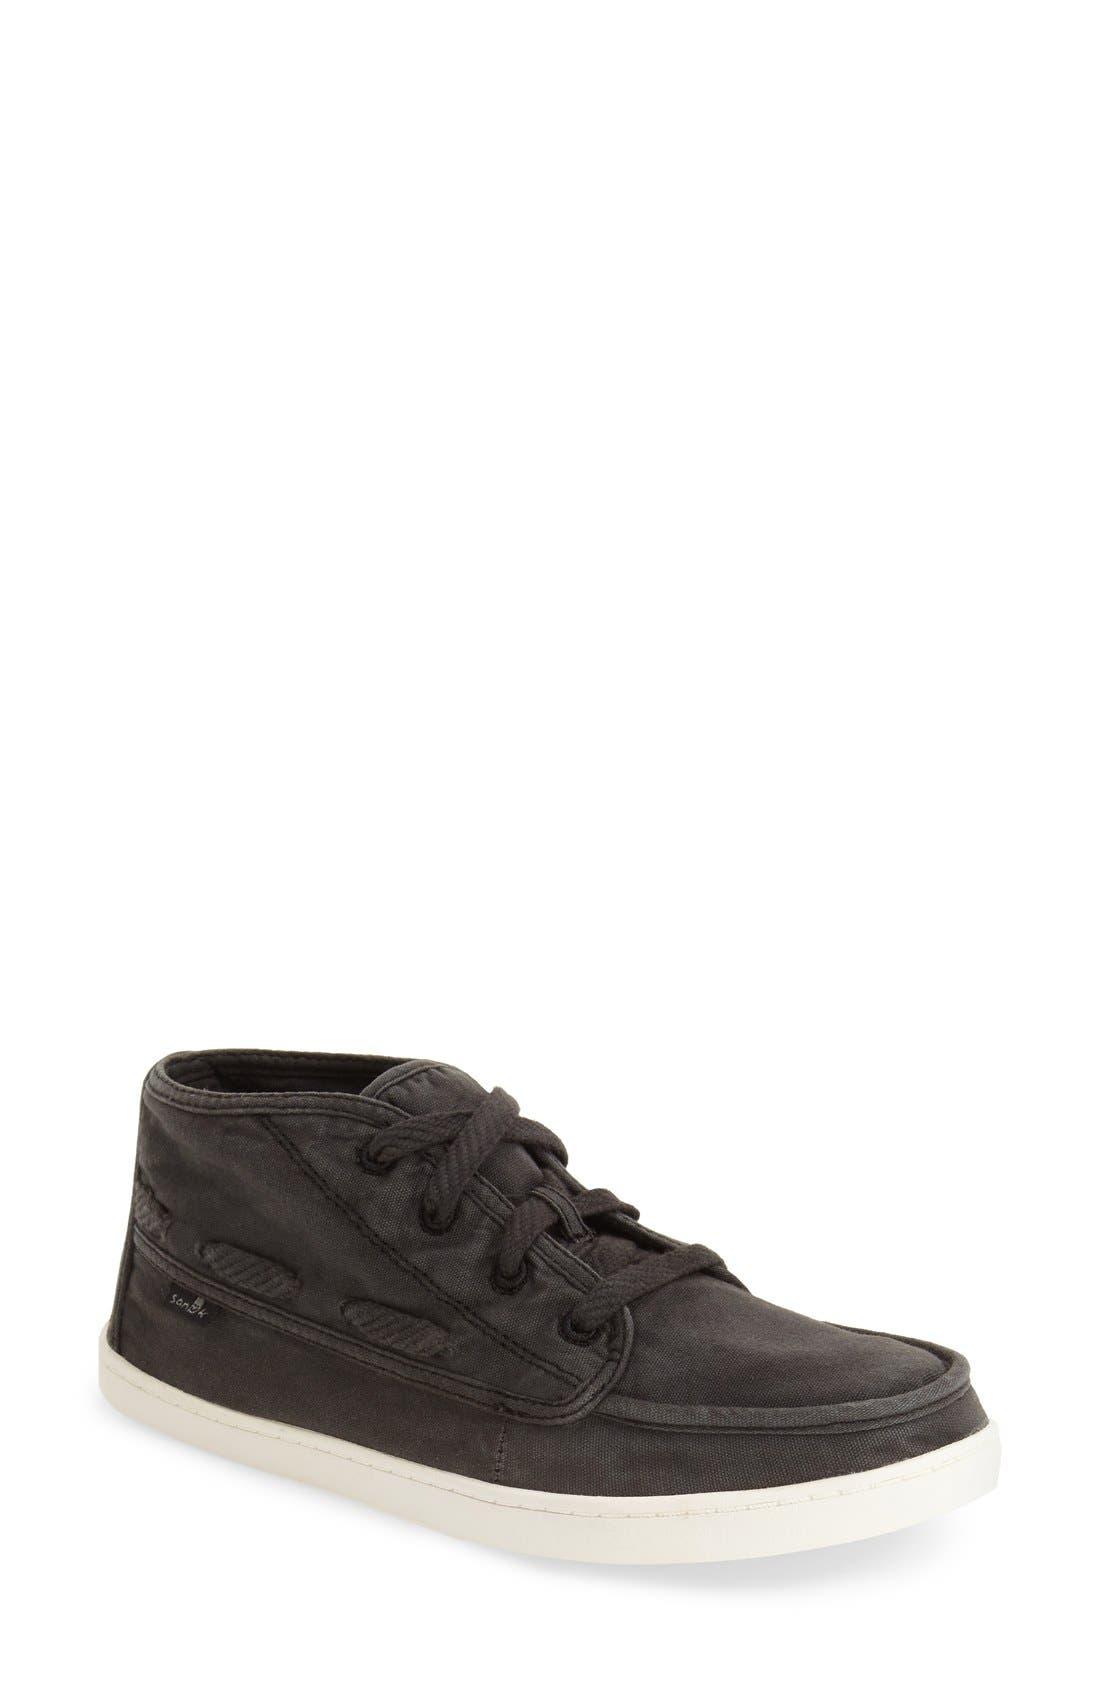 'Vee K Shawn' High Top Sneaker,                         Main,                         color, 006